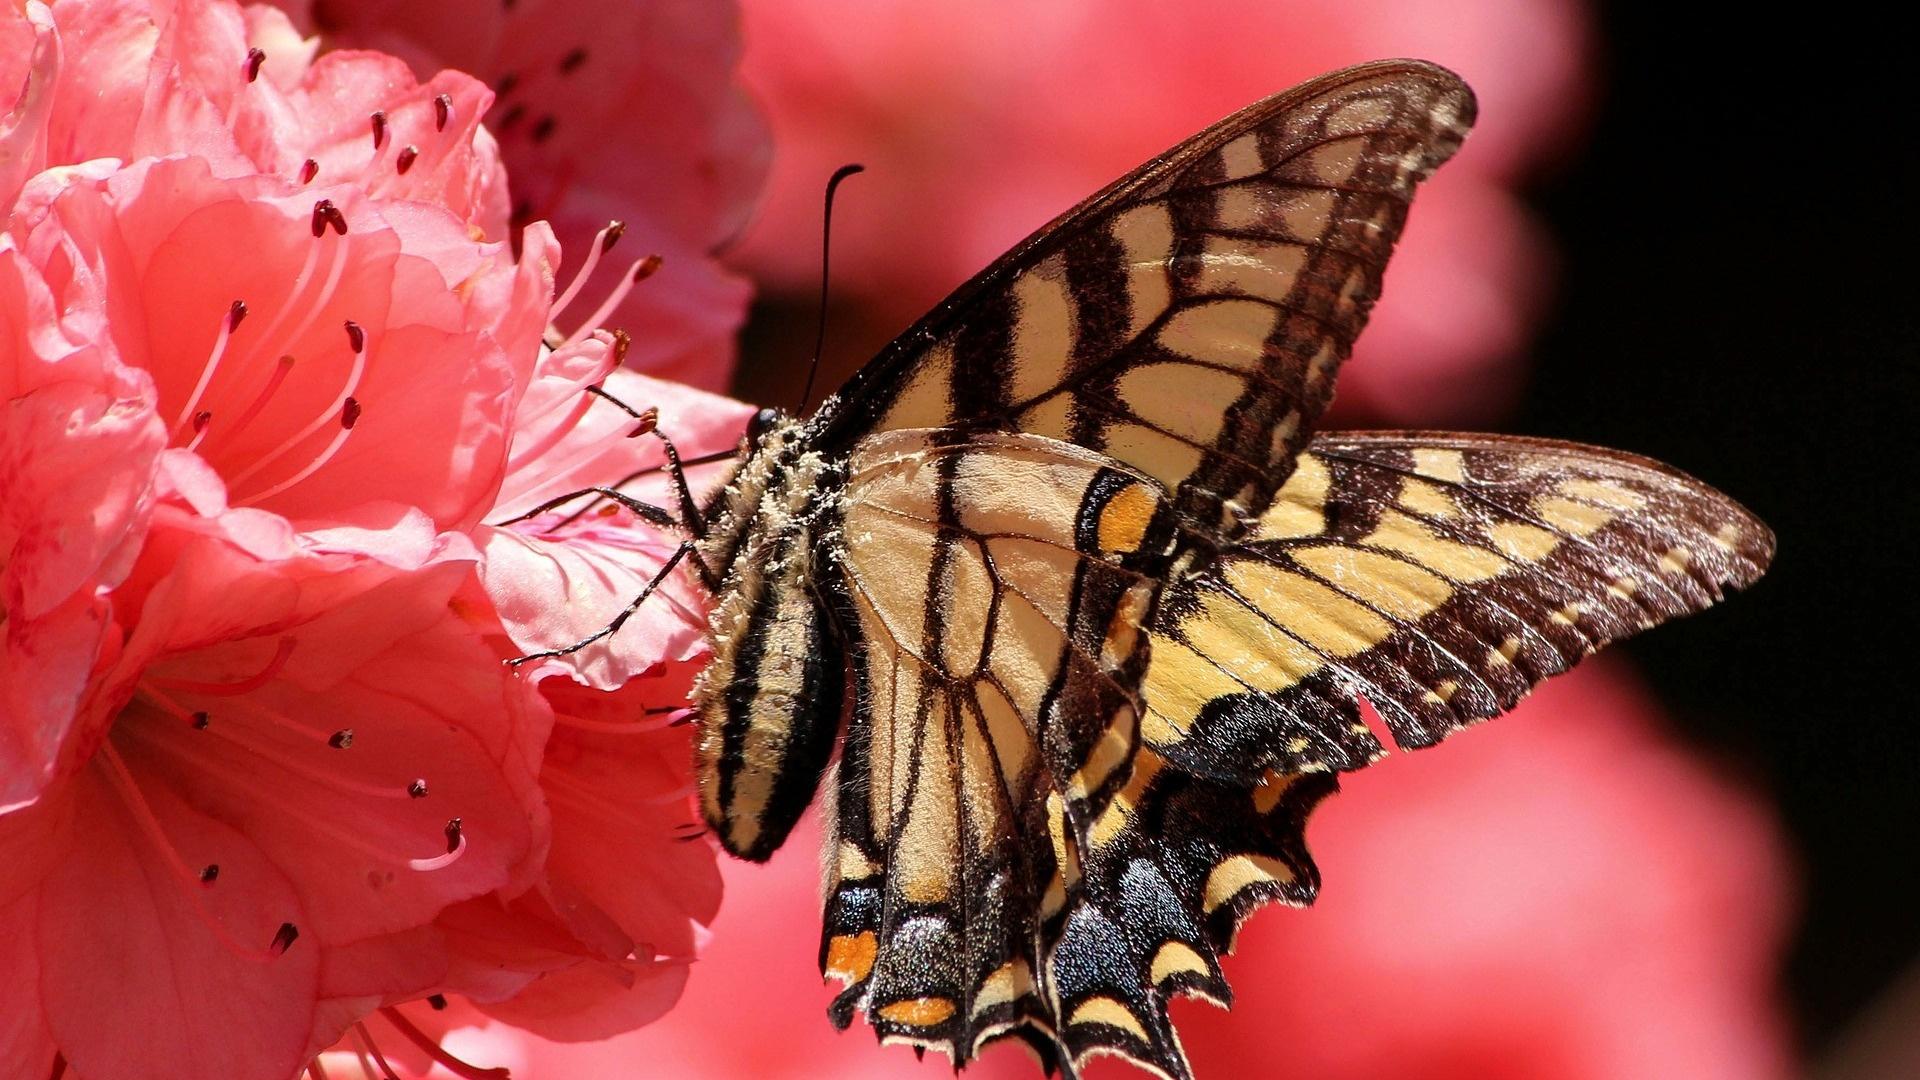 Butterfly On A Flower Wallpaper theme